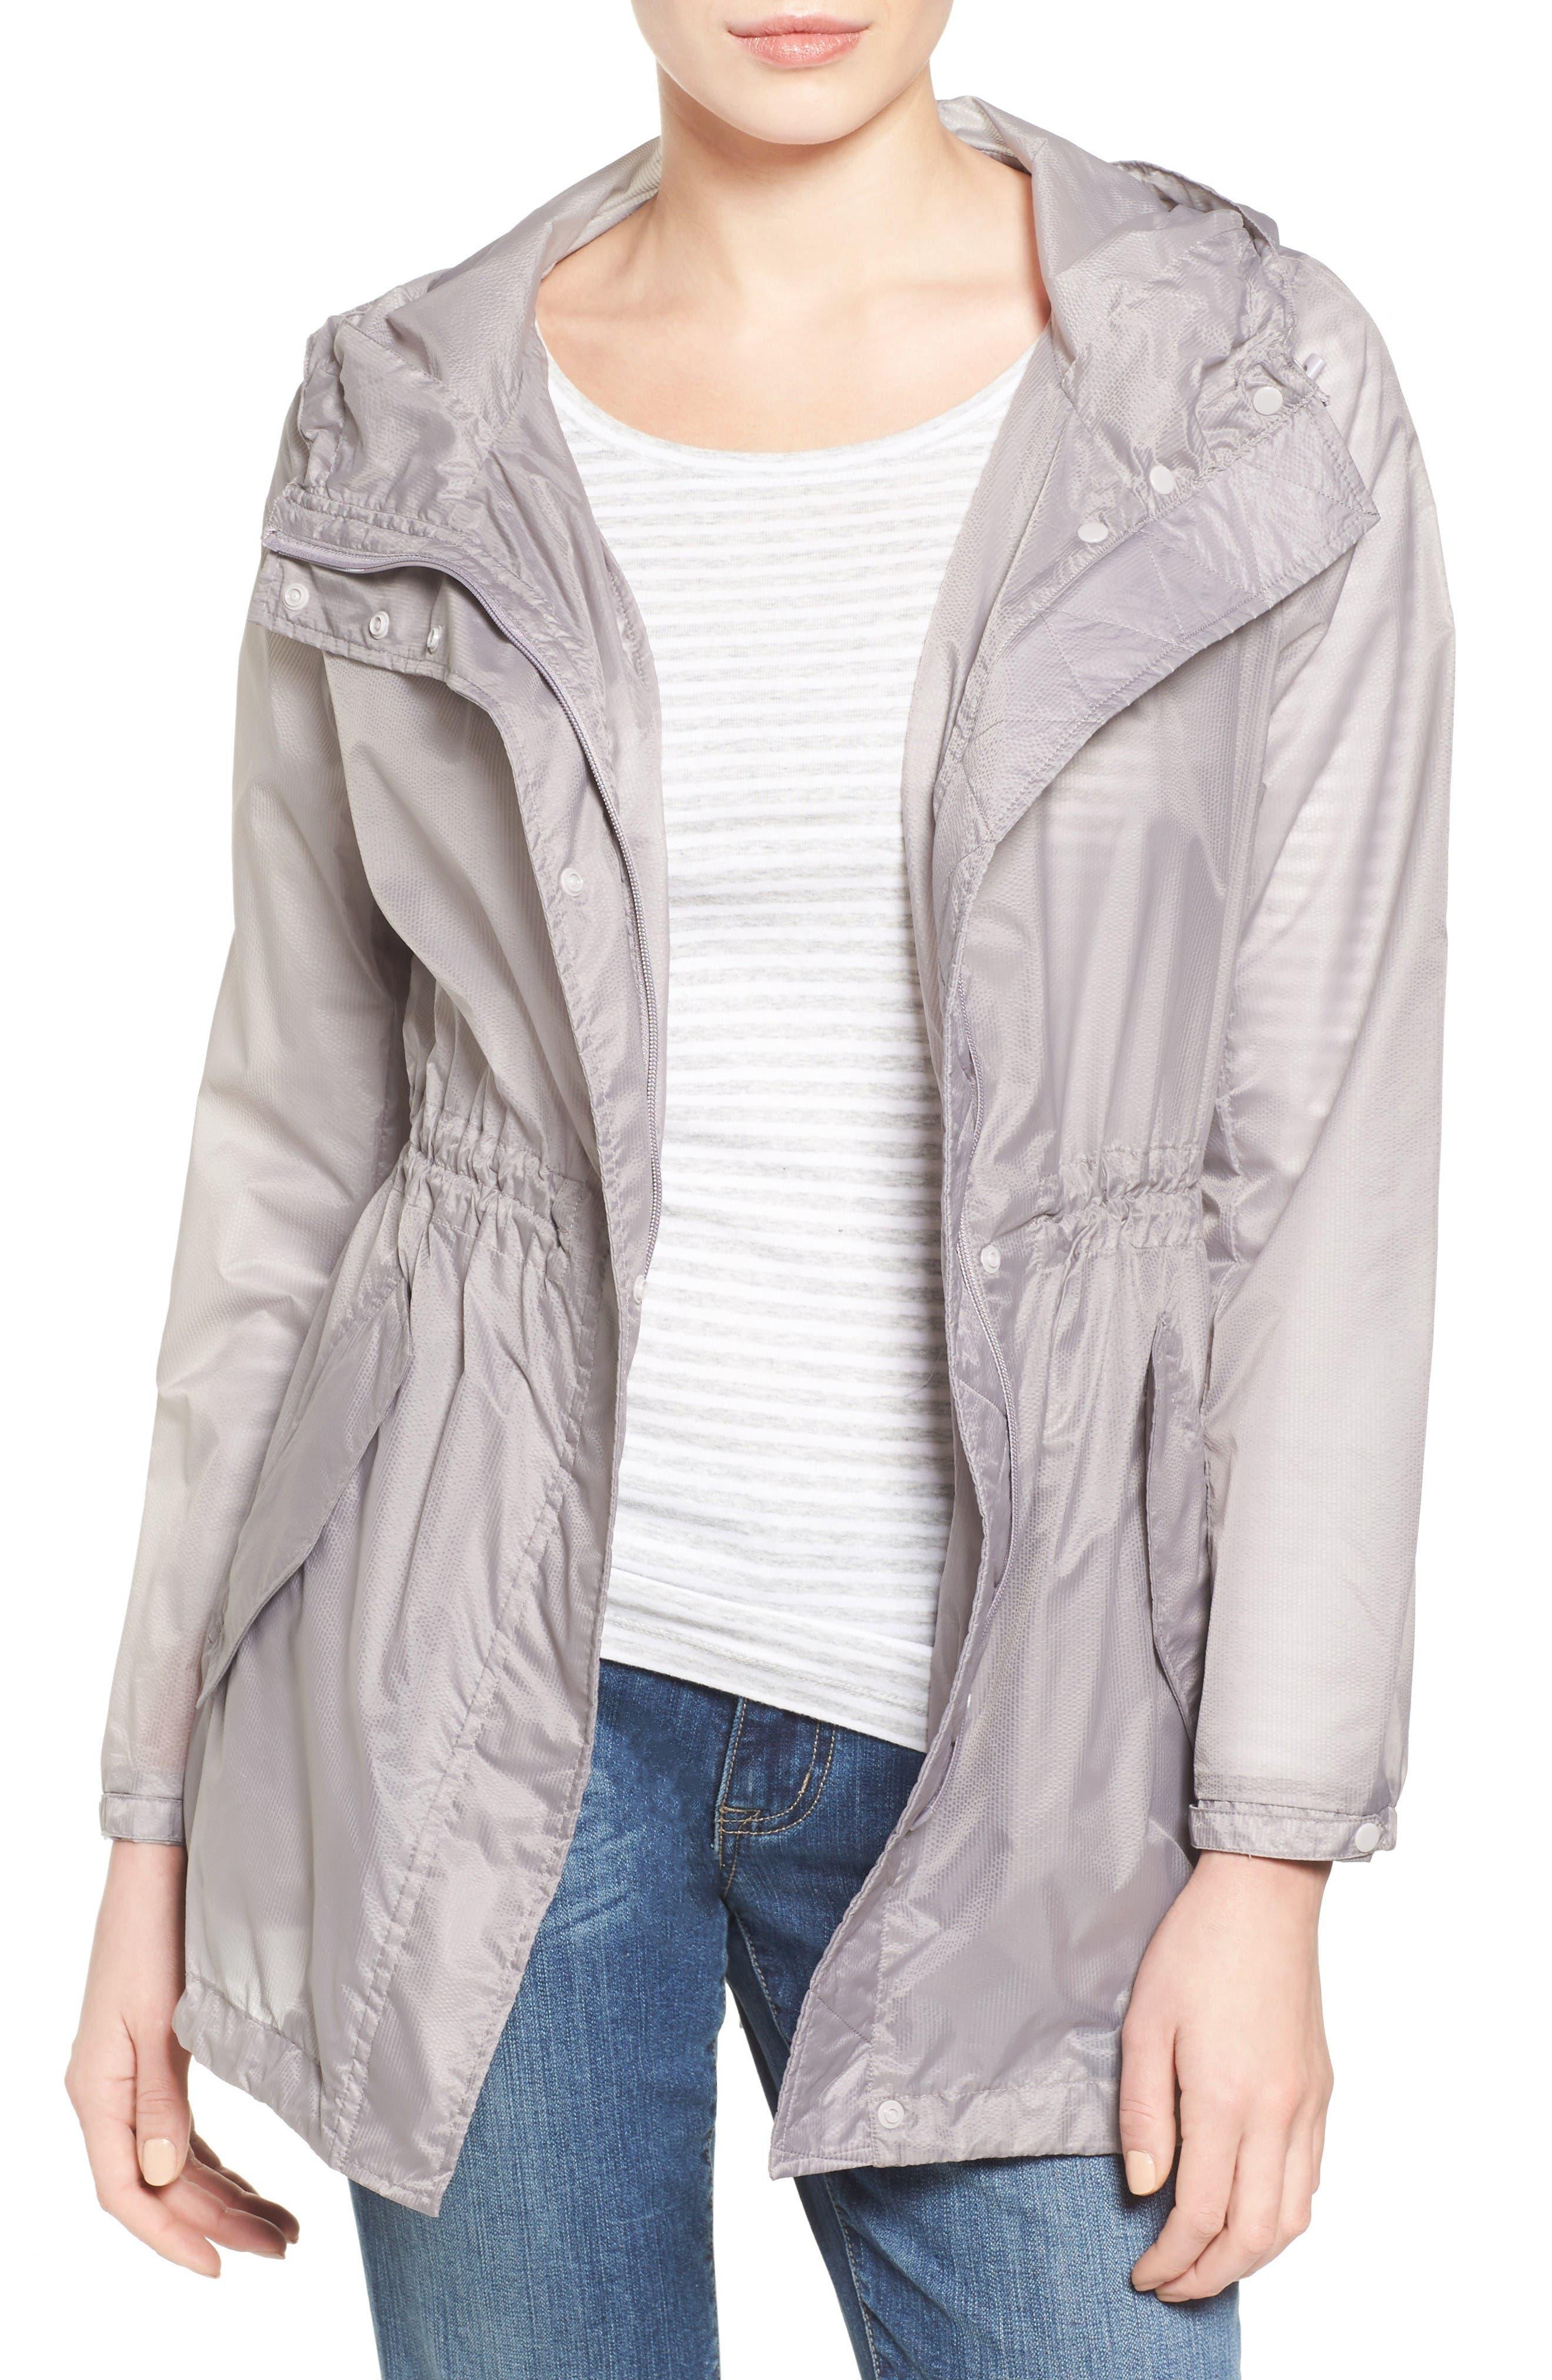 Teri Translucent Rain Jacket,                         Main,                         color, Fog